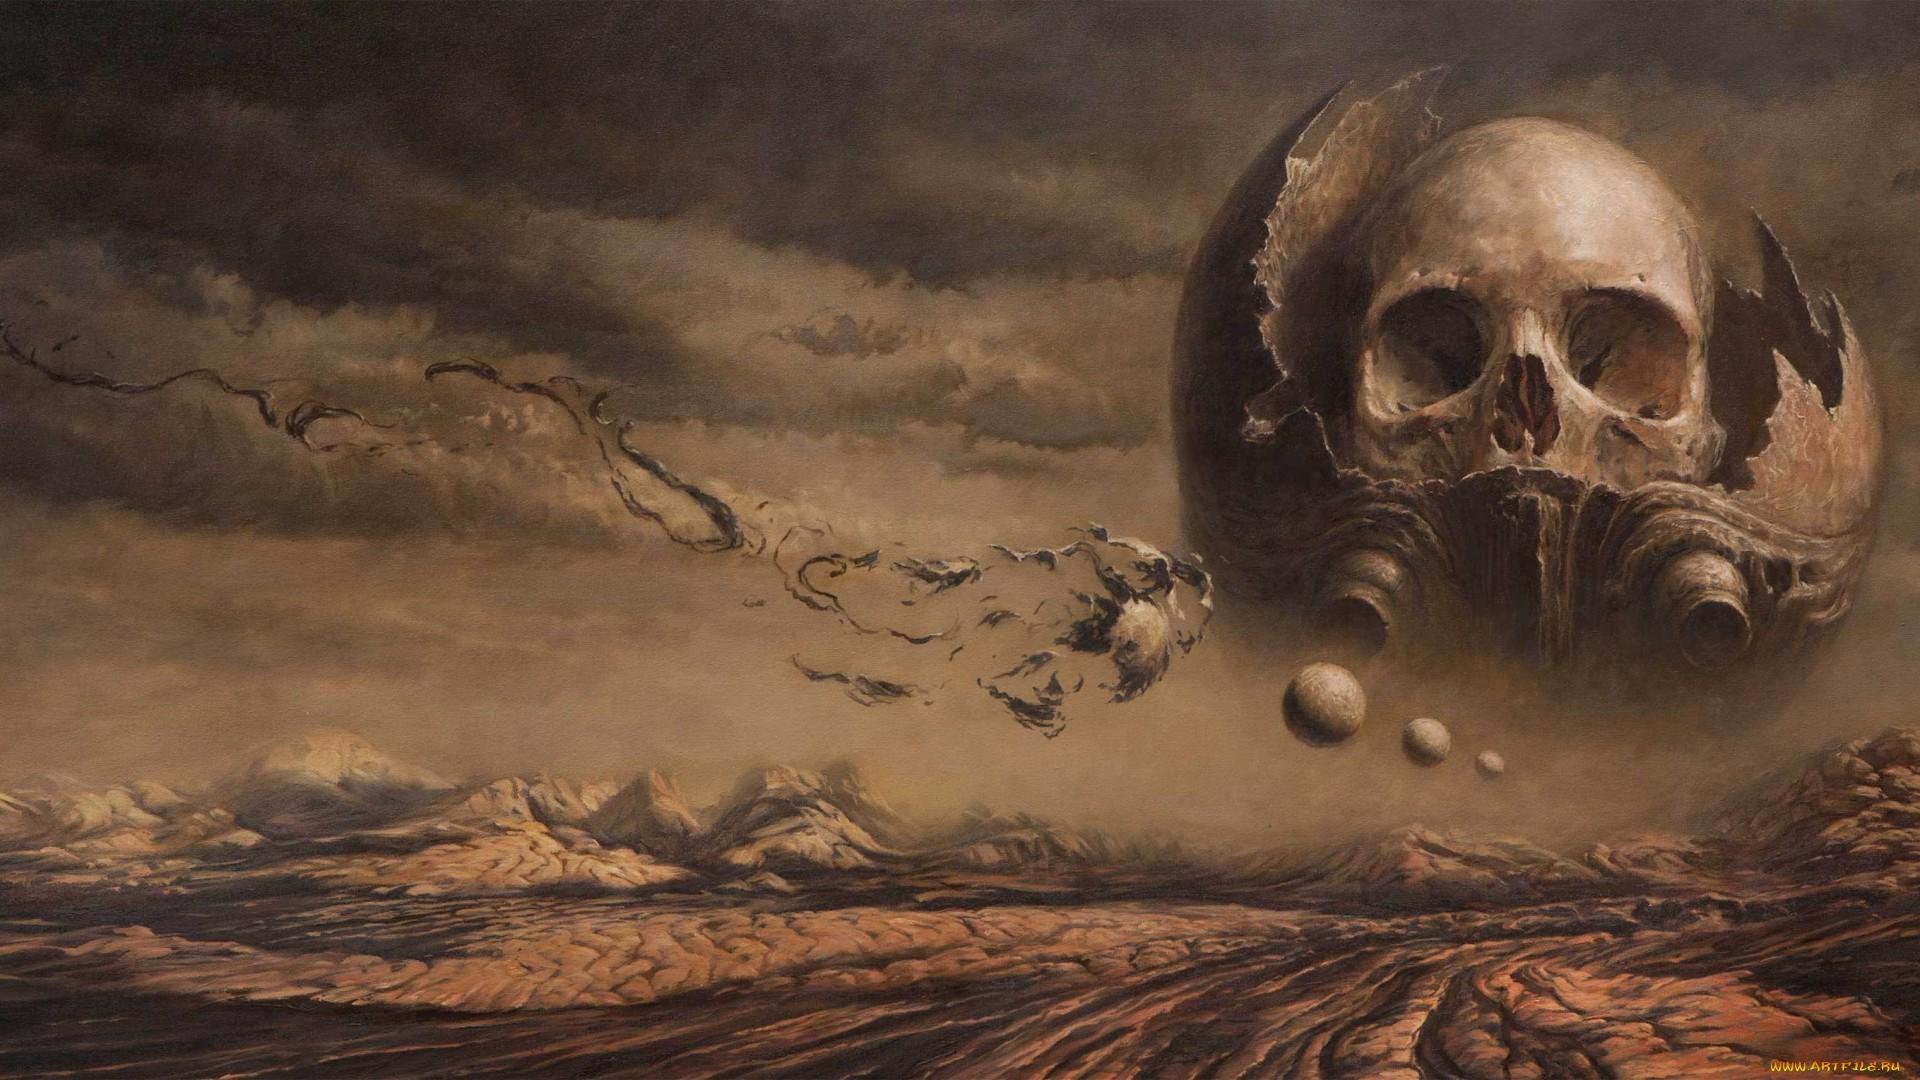 Landscape Fantasy Art Sky Artwork Dark Skull Mythology Darkness Screenshot Computer Wallpaper